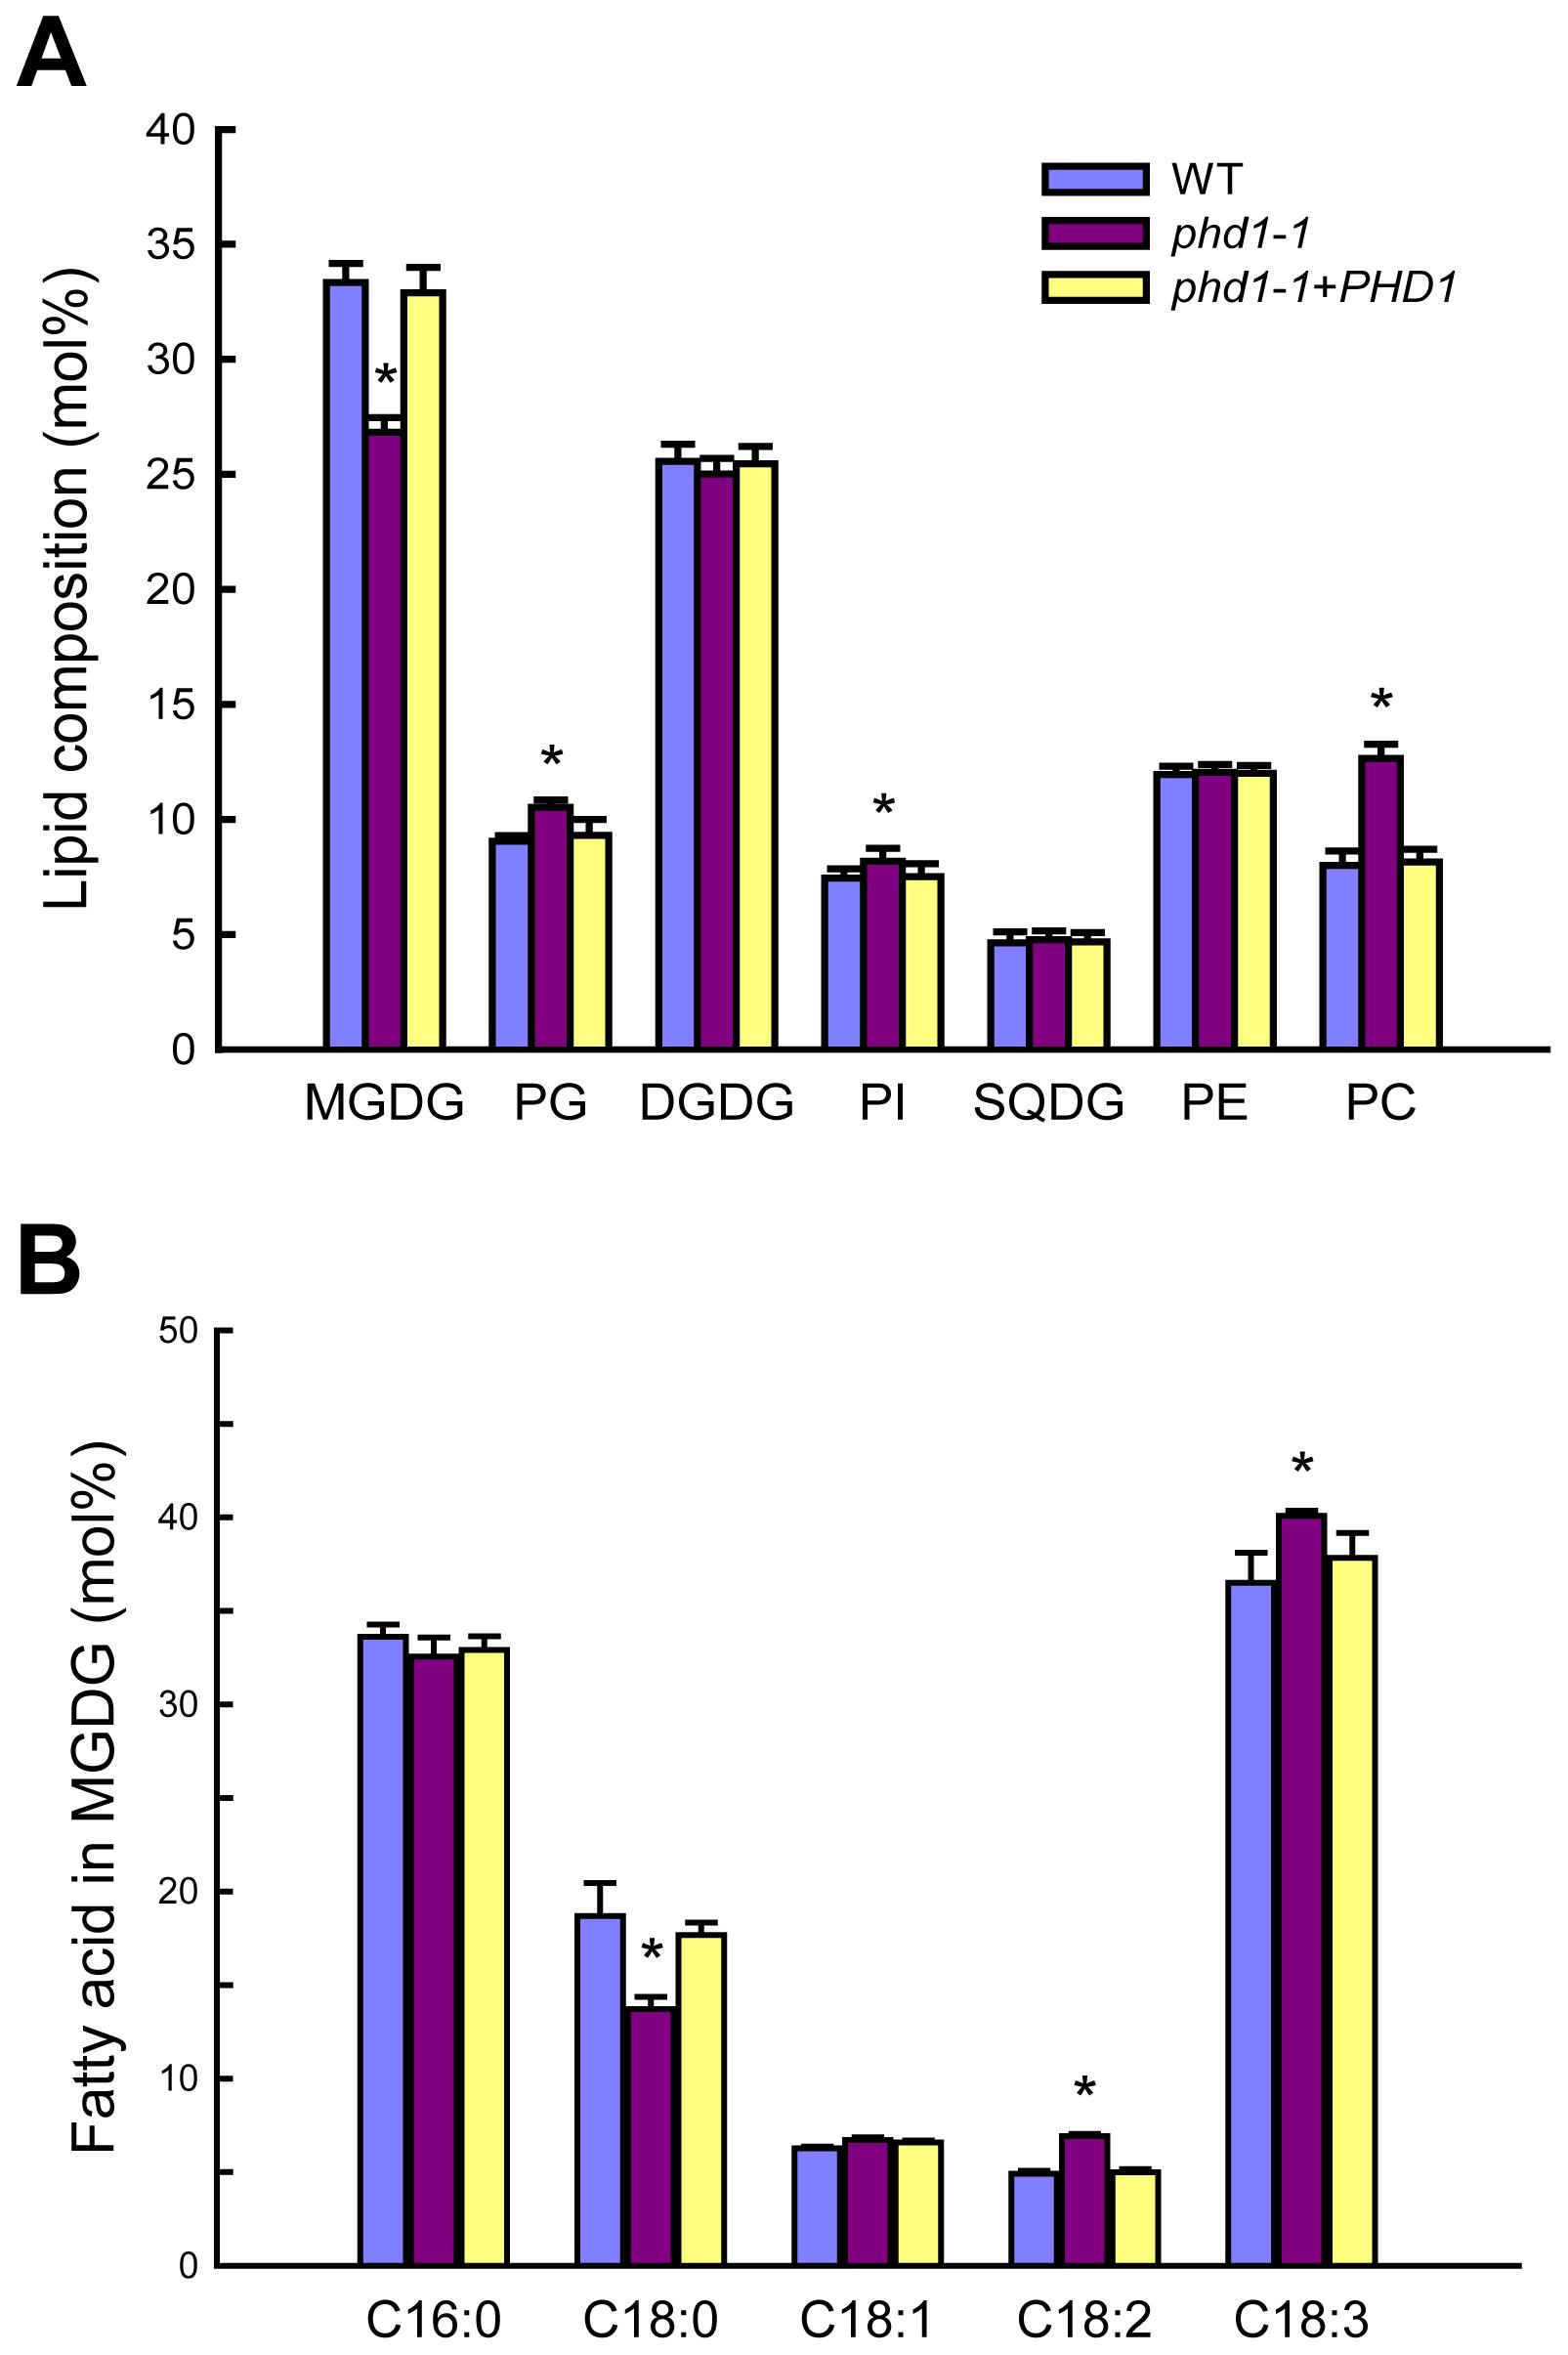 Polar lipid composition and fatty acid profiles in leaves of wild type, <i>phd1</i>-<i>1</i>, and <i>PHD1</i>-complemented plants.